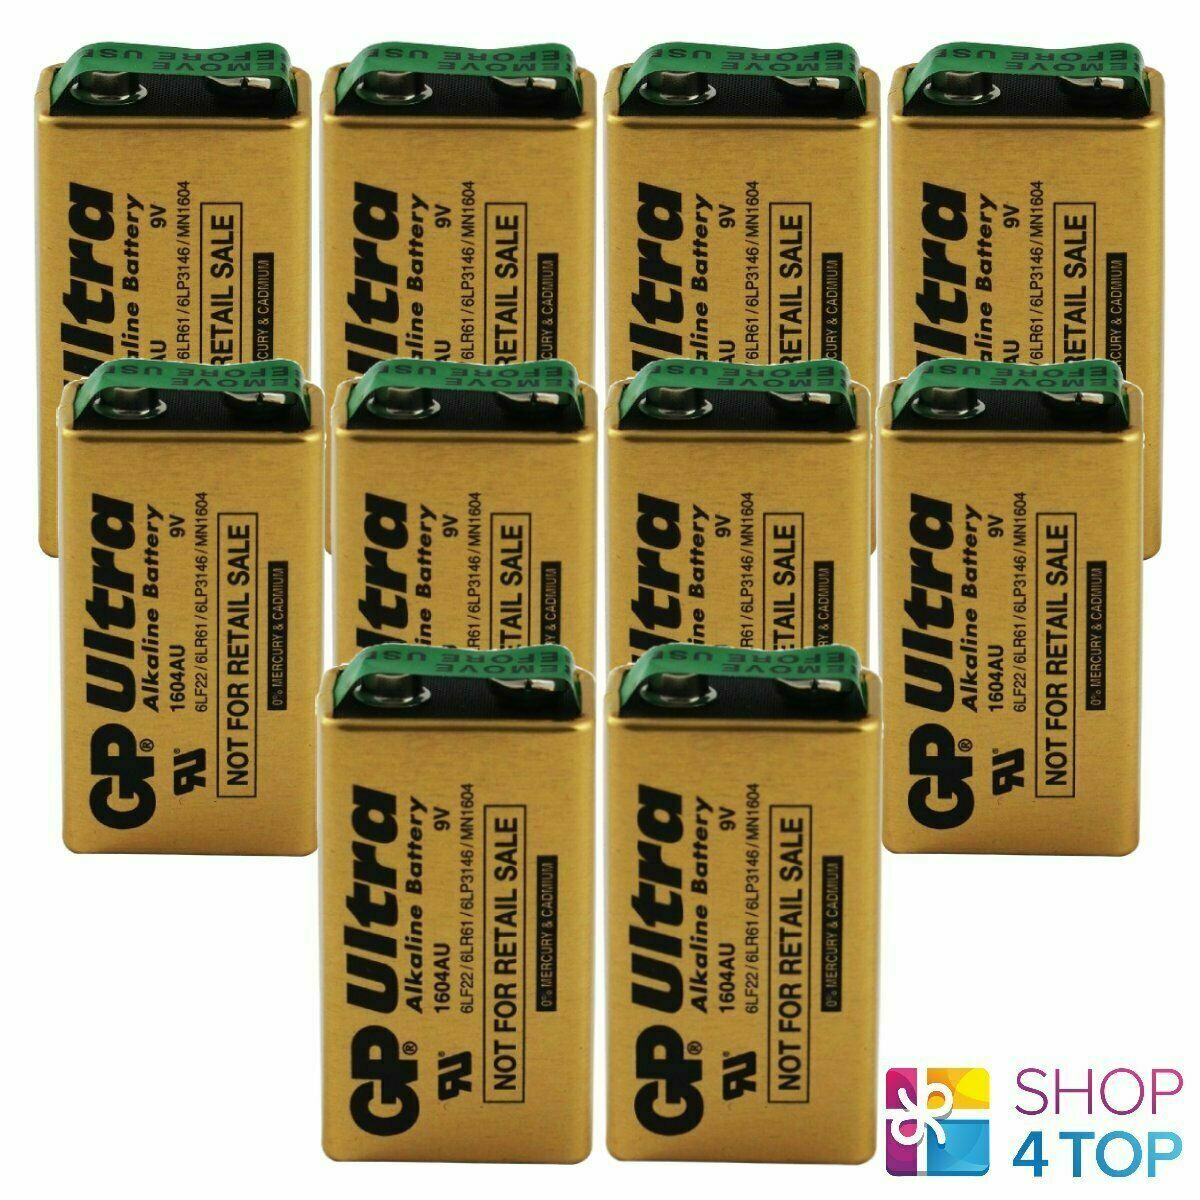 10 GP Ultra Alkaline Battery Industrial 9V 6LR61 E Block MN1604 6LF22 2025 NEW